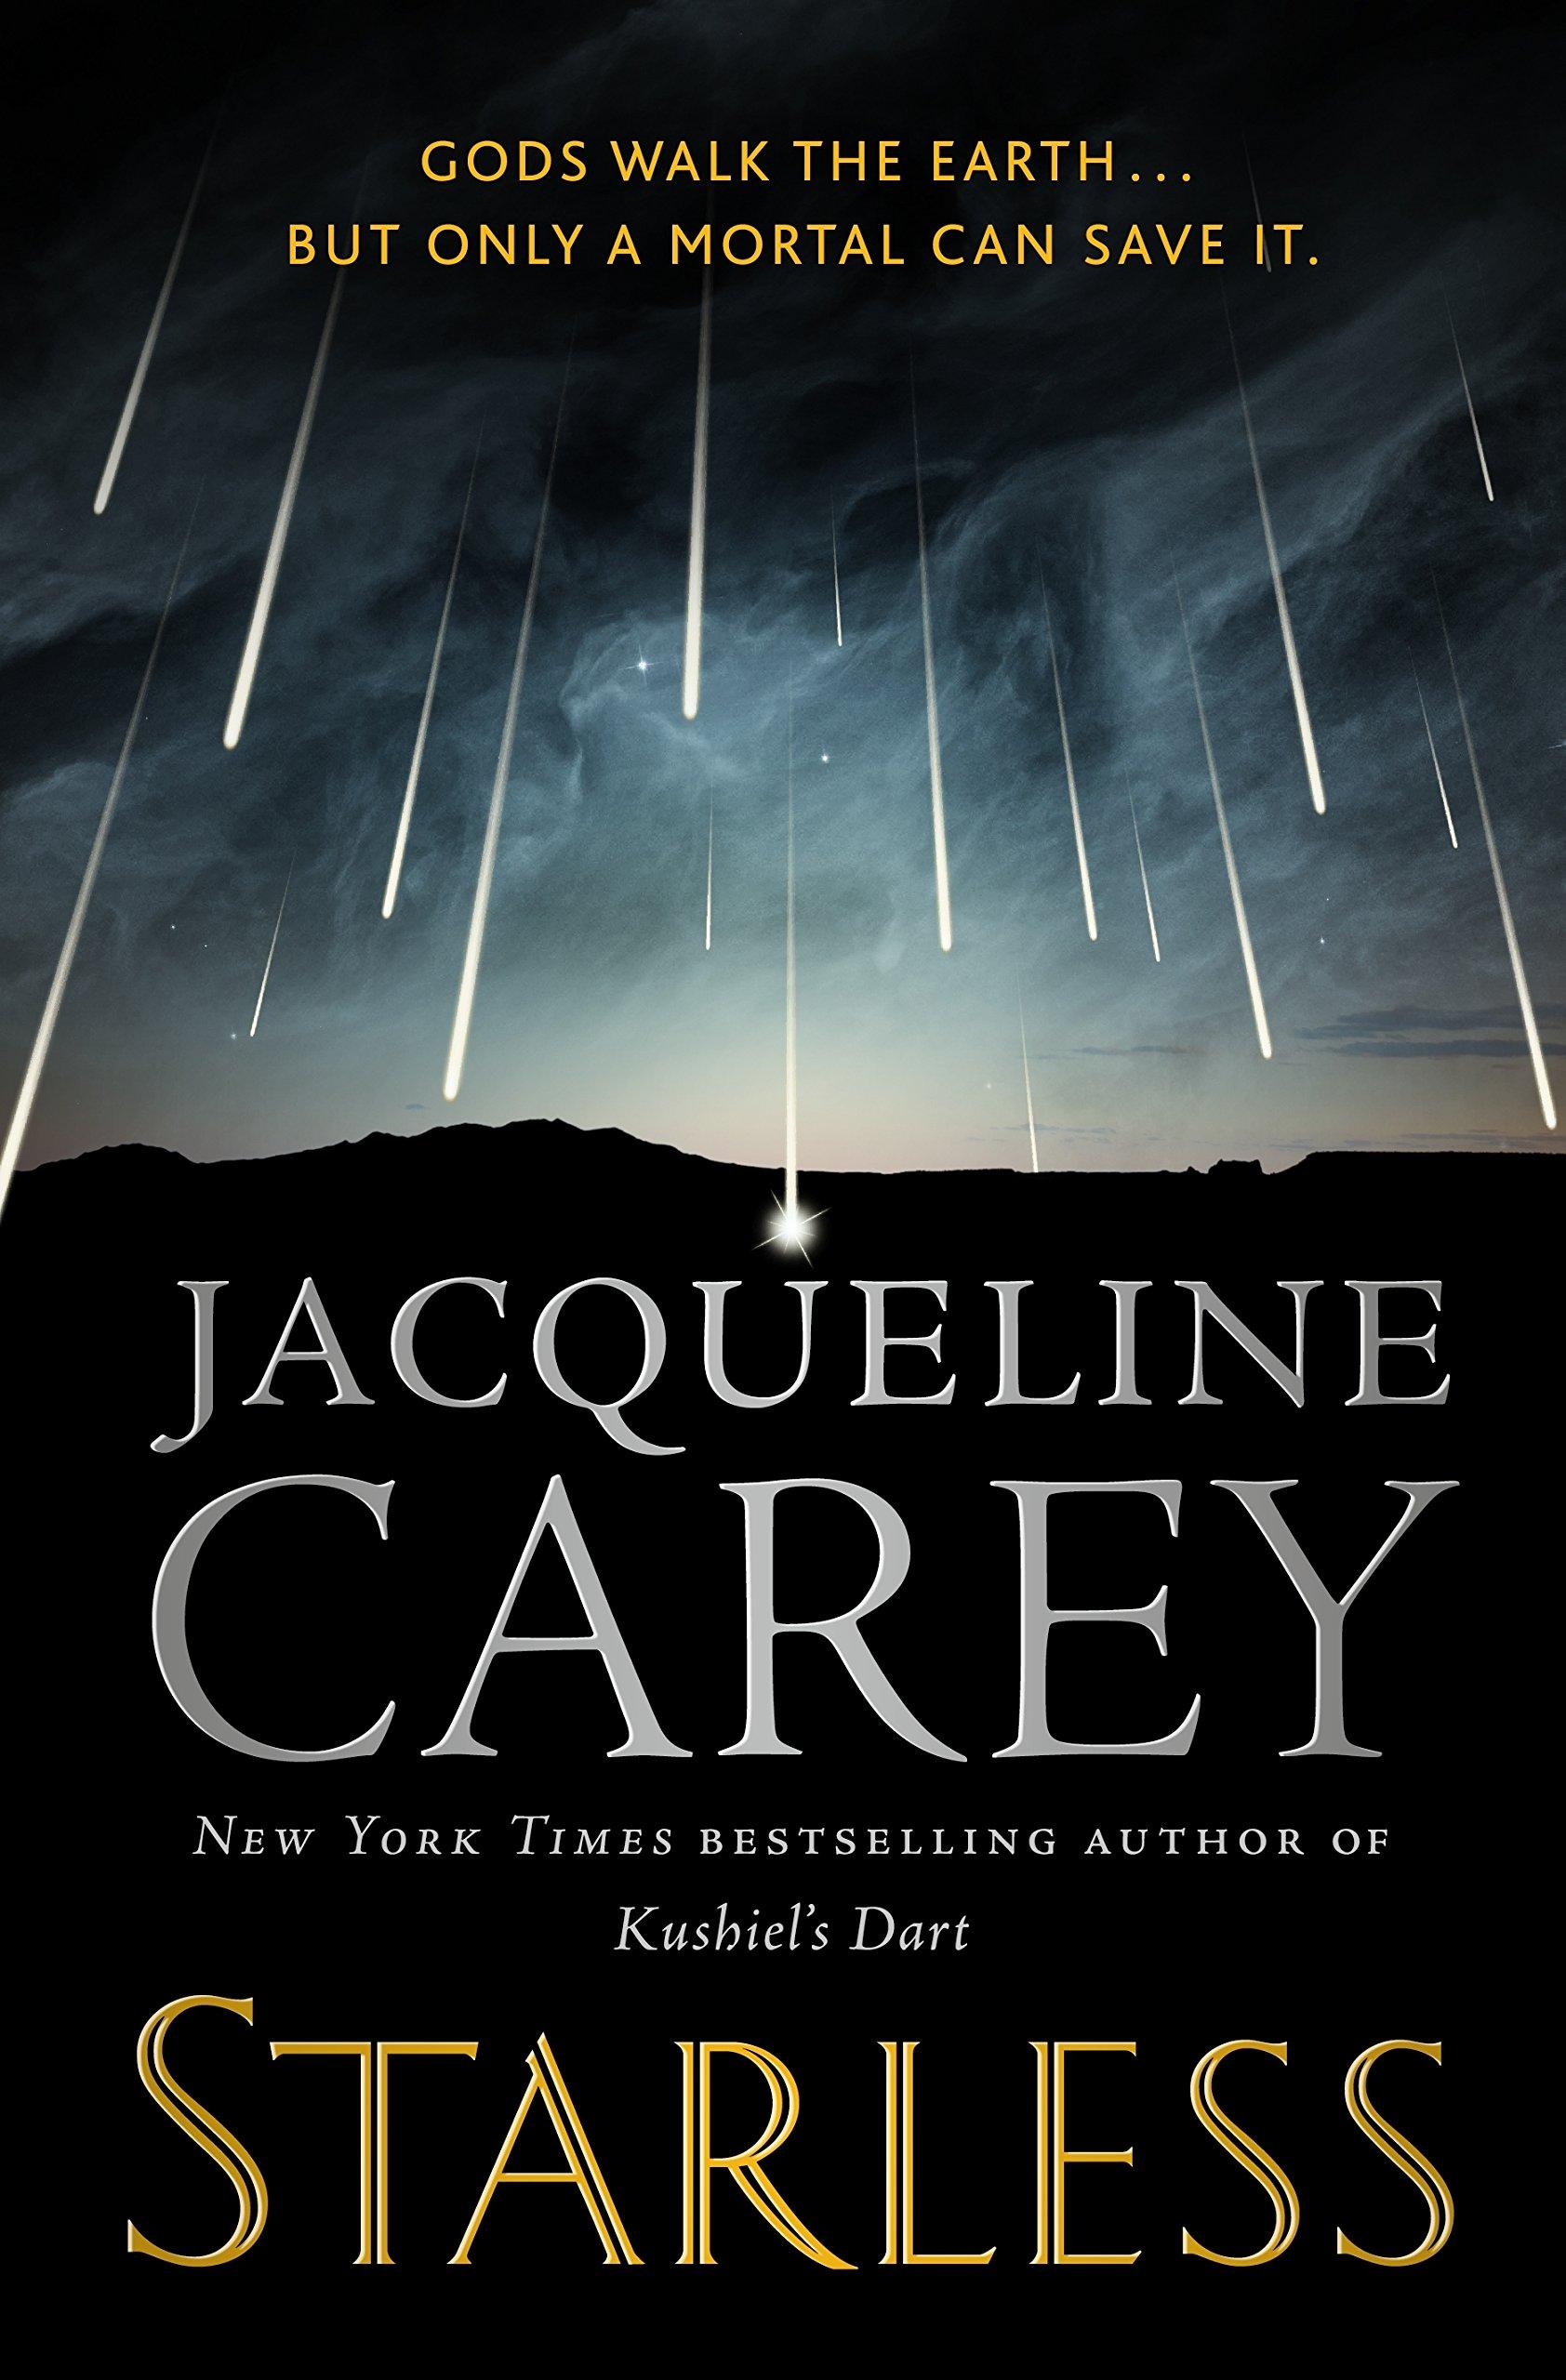 Starless: Jacqueline Carey: 9780765386823: Amazon.com: Books on malazan world map, terre d'ange map, randland map, tamil map, camorr map,